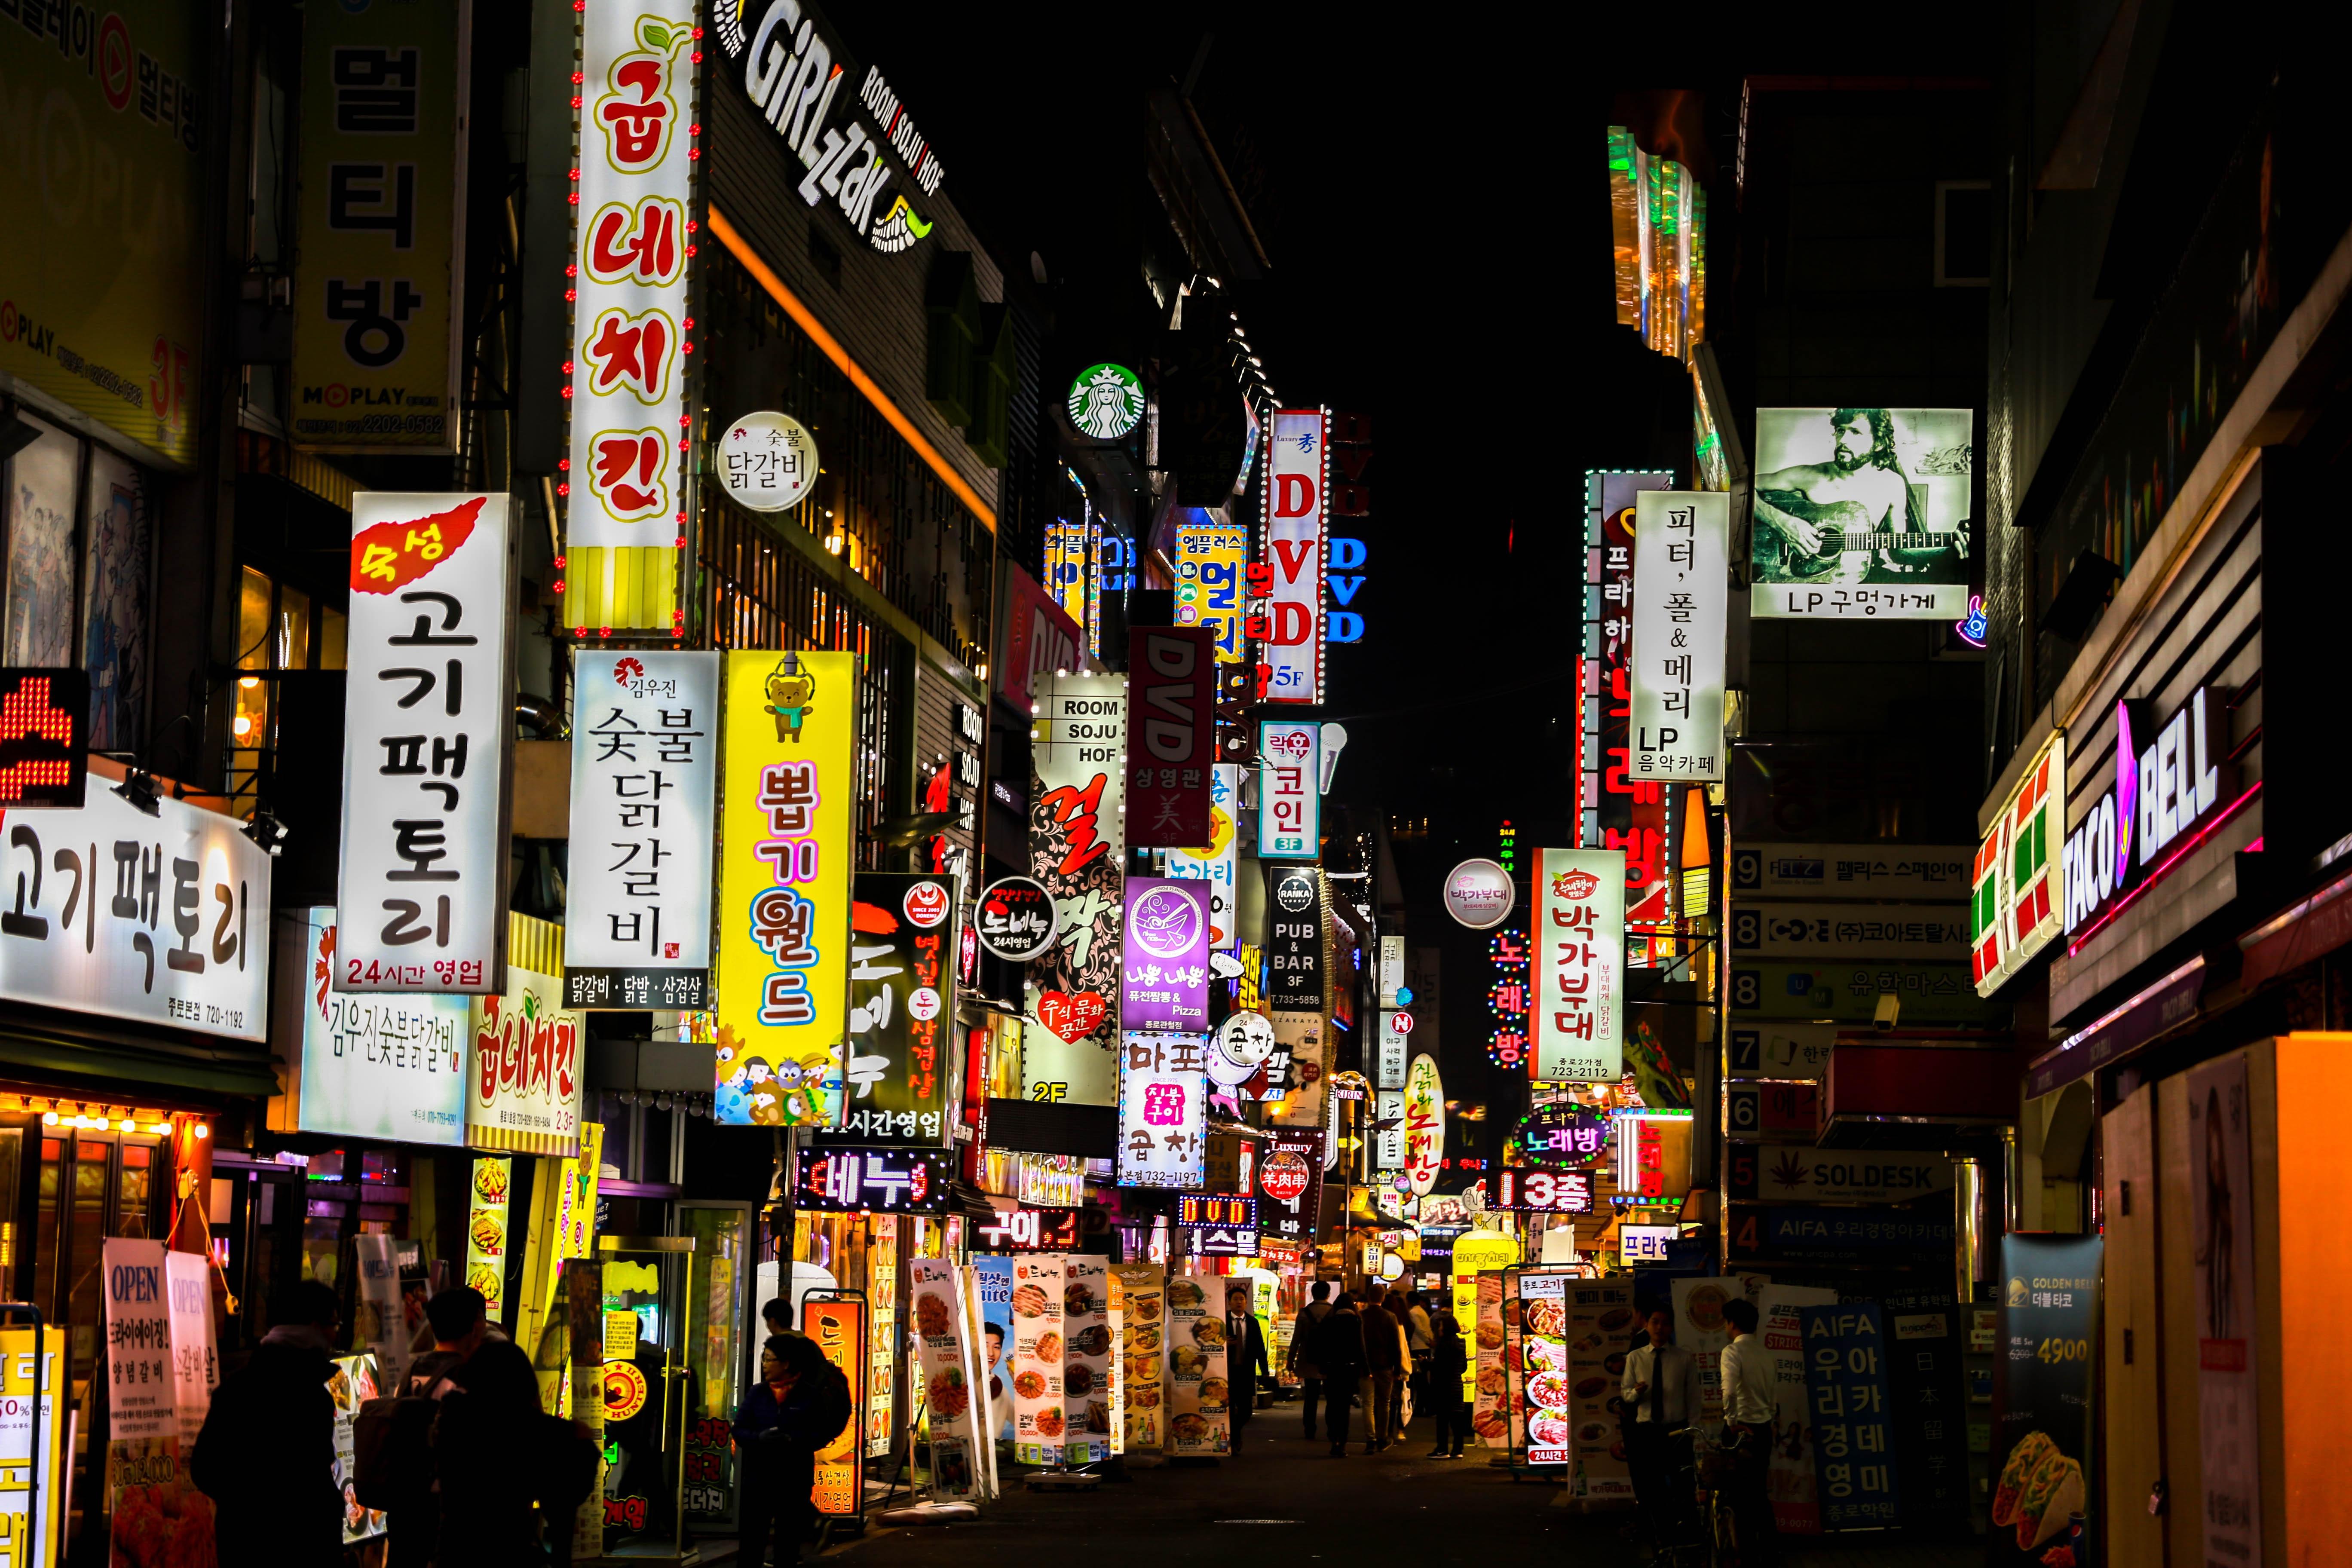 Wisata Korea di malam hari (saungkorea.com)